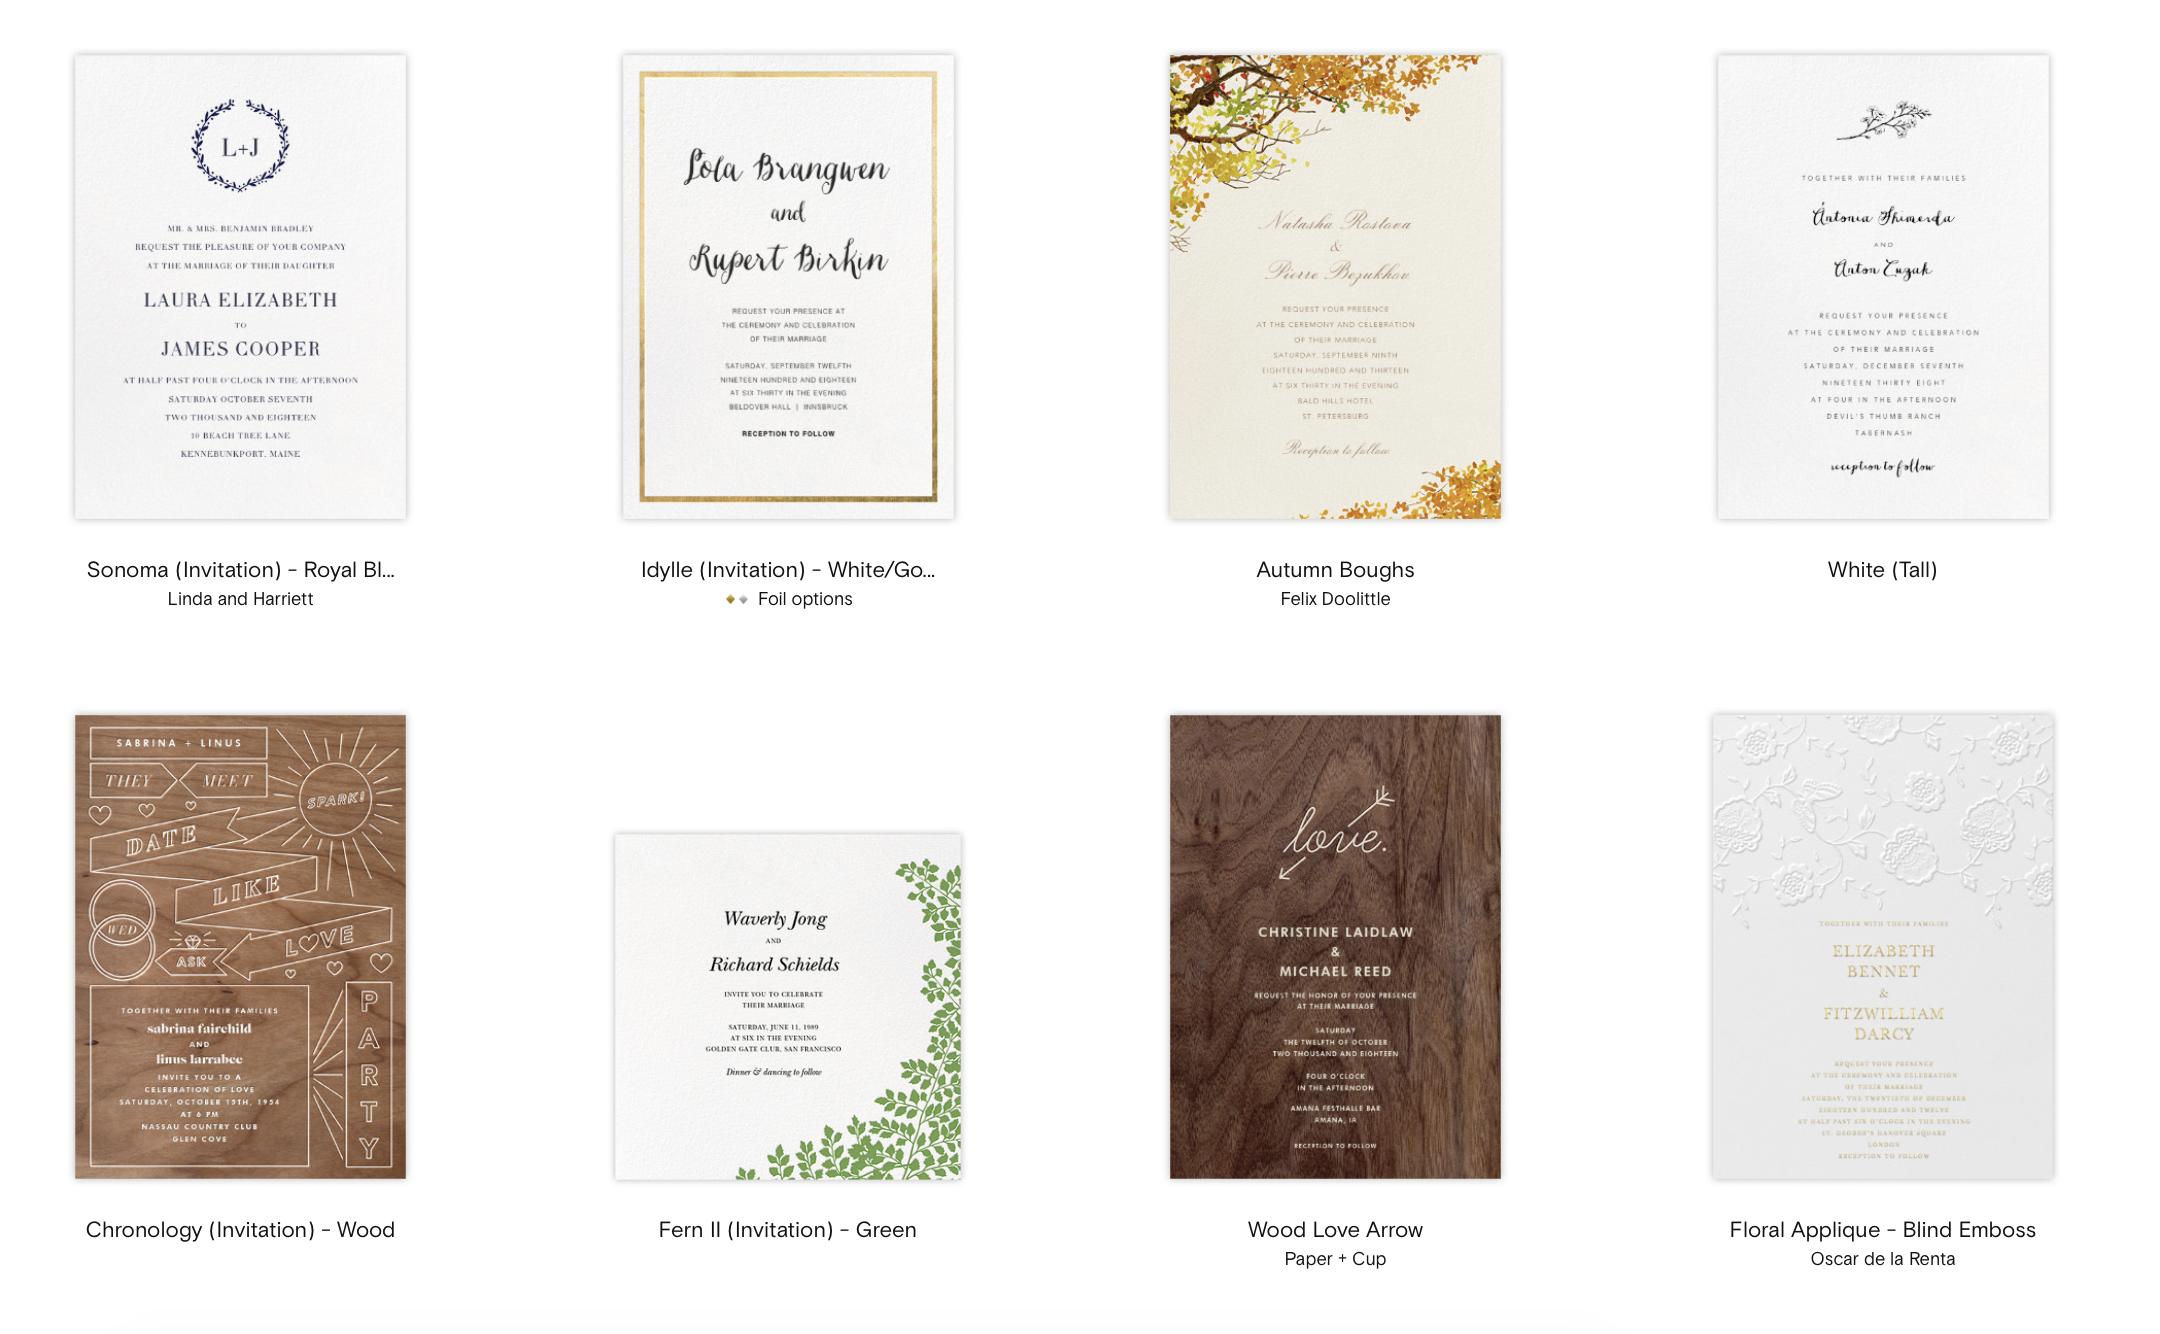 Paperless Post Helps Make Wedding Planning Easy